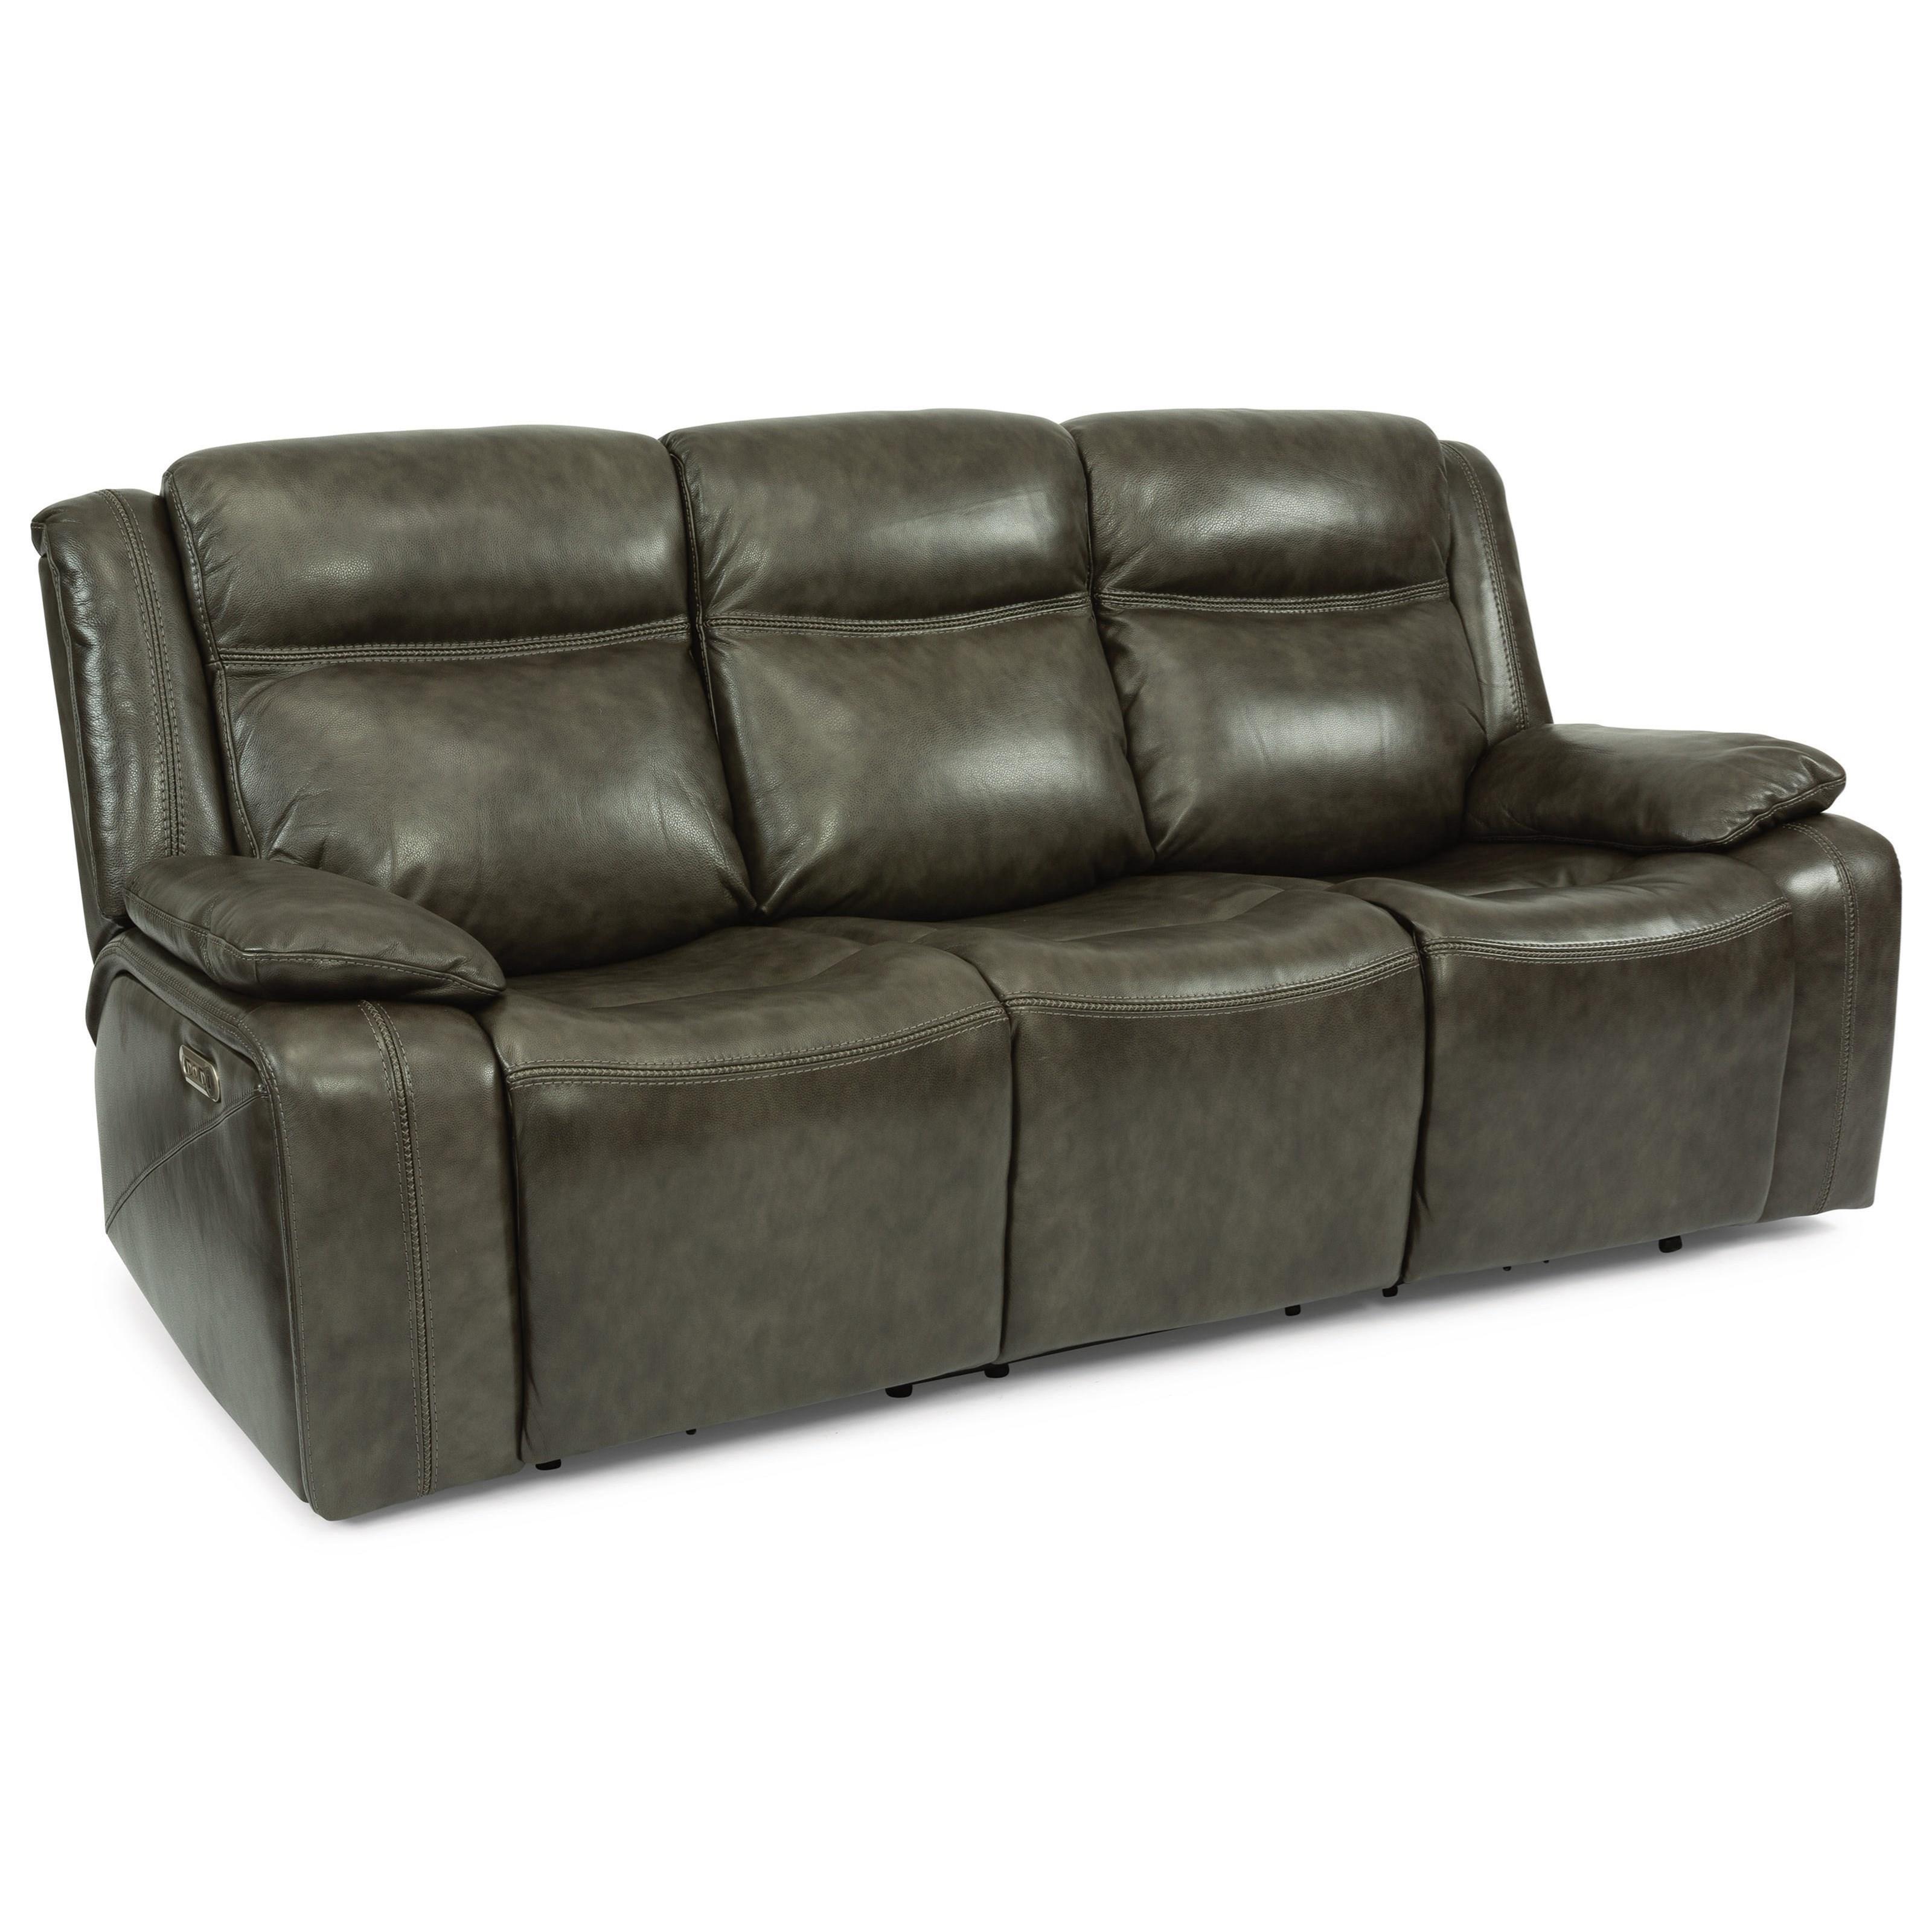 Latitudes - Journey Power Reclining Sofa by Flexsteel at Walker's Furniture